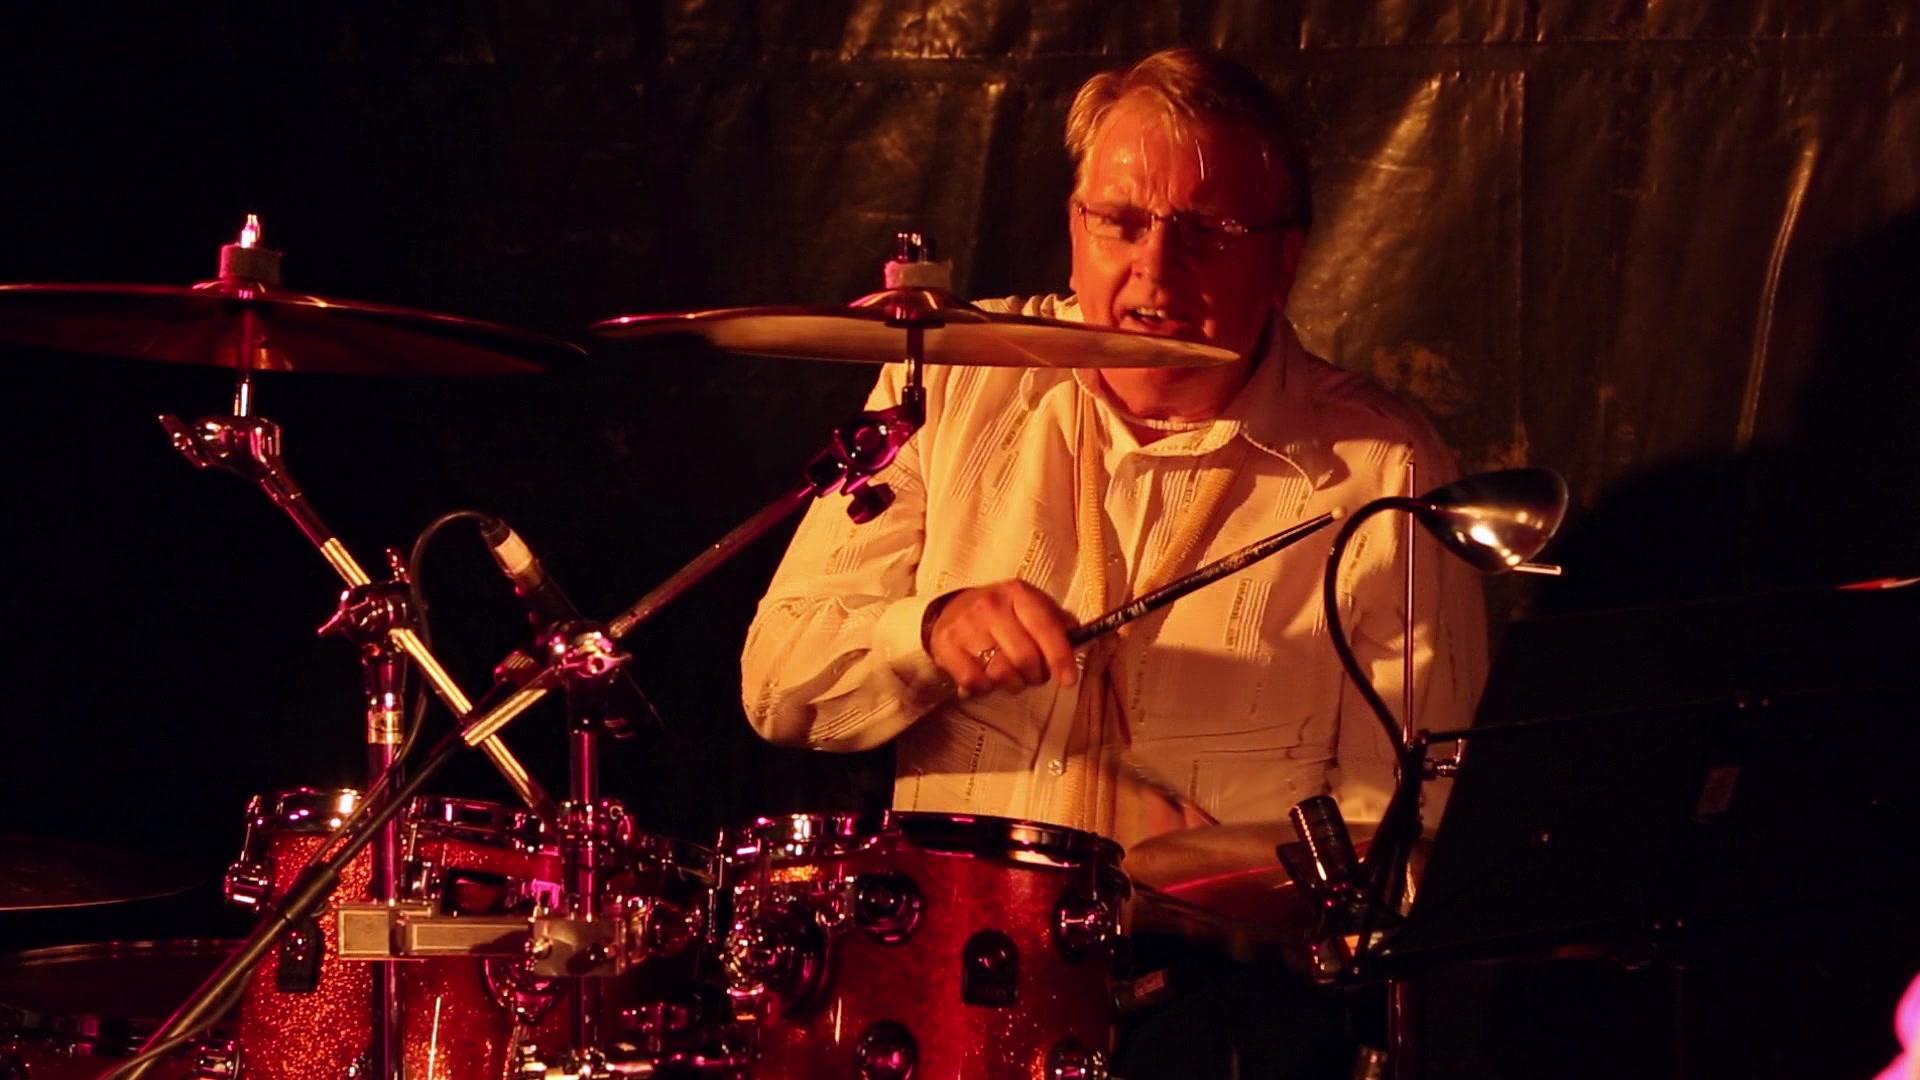 Drummer ABBA Chique